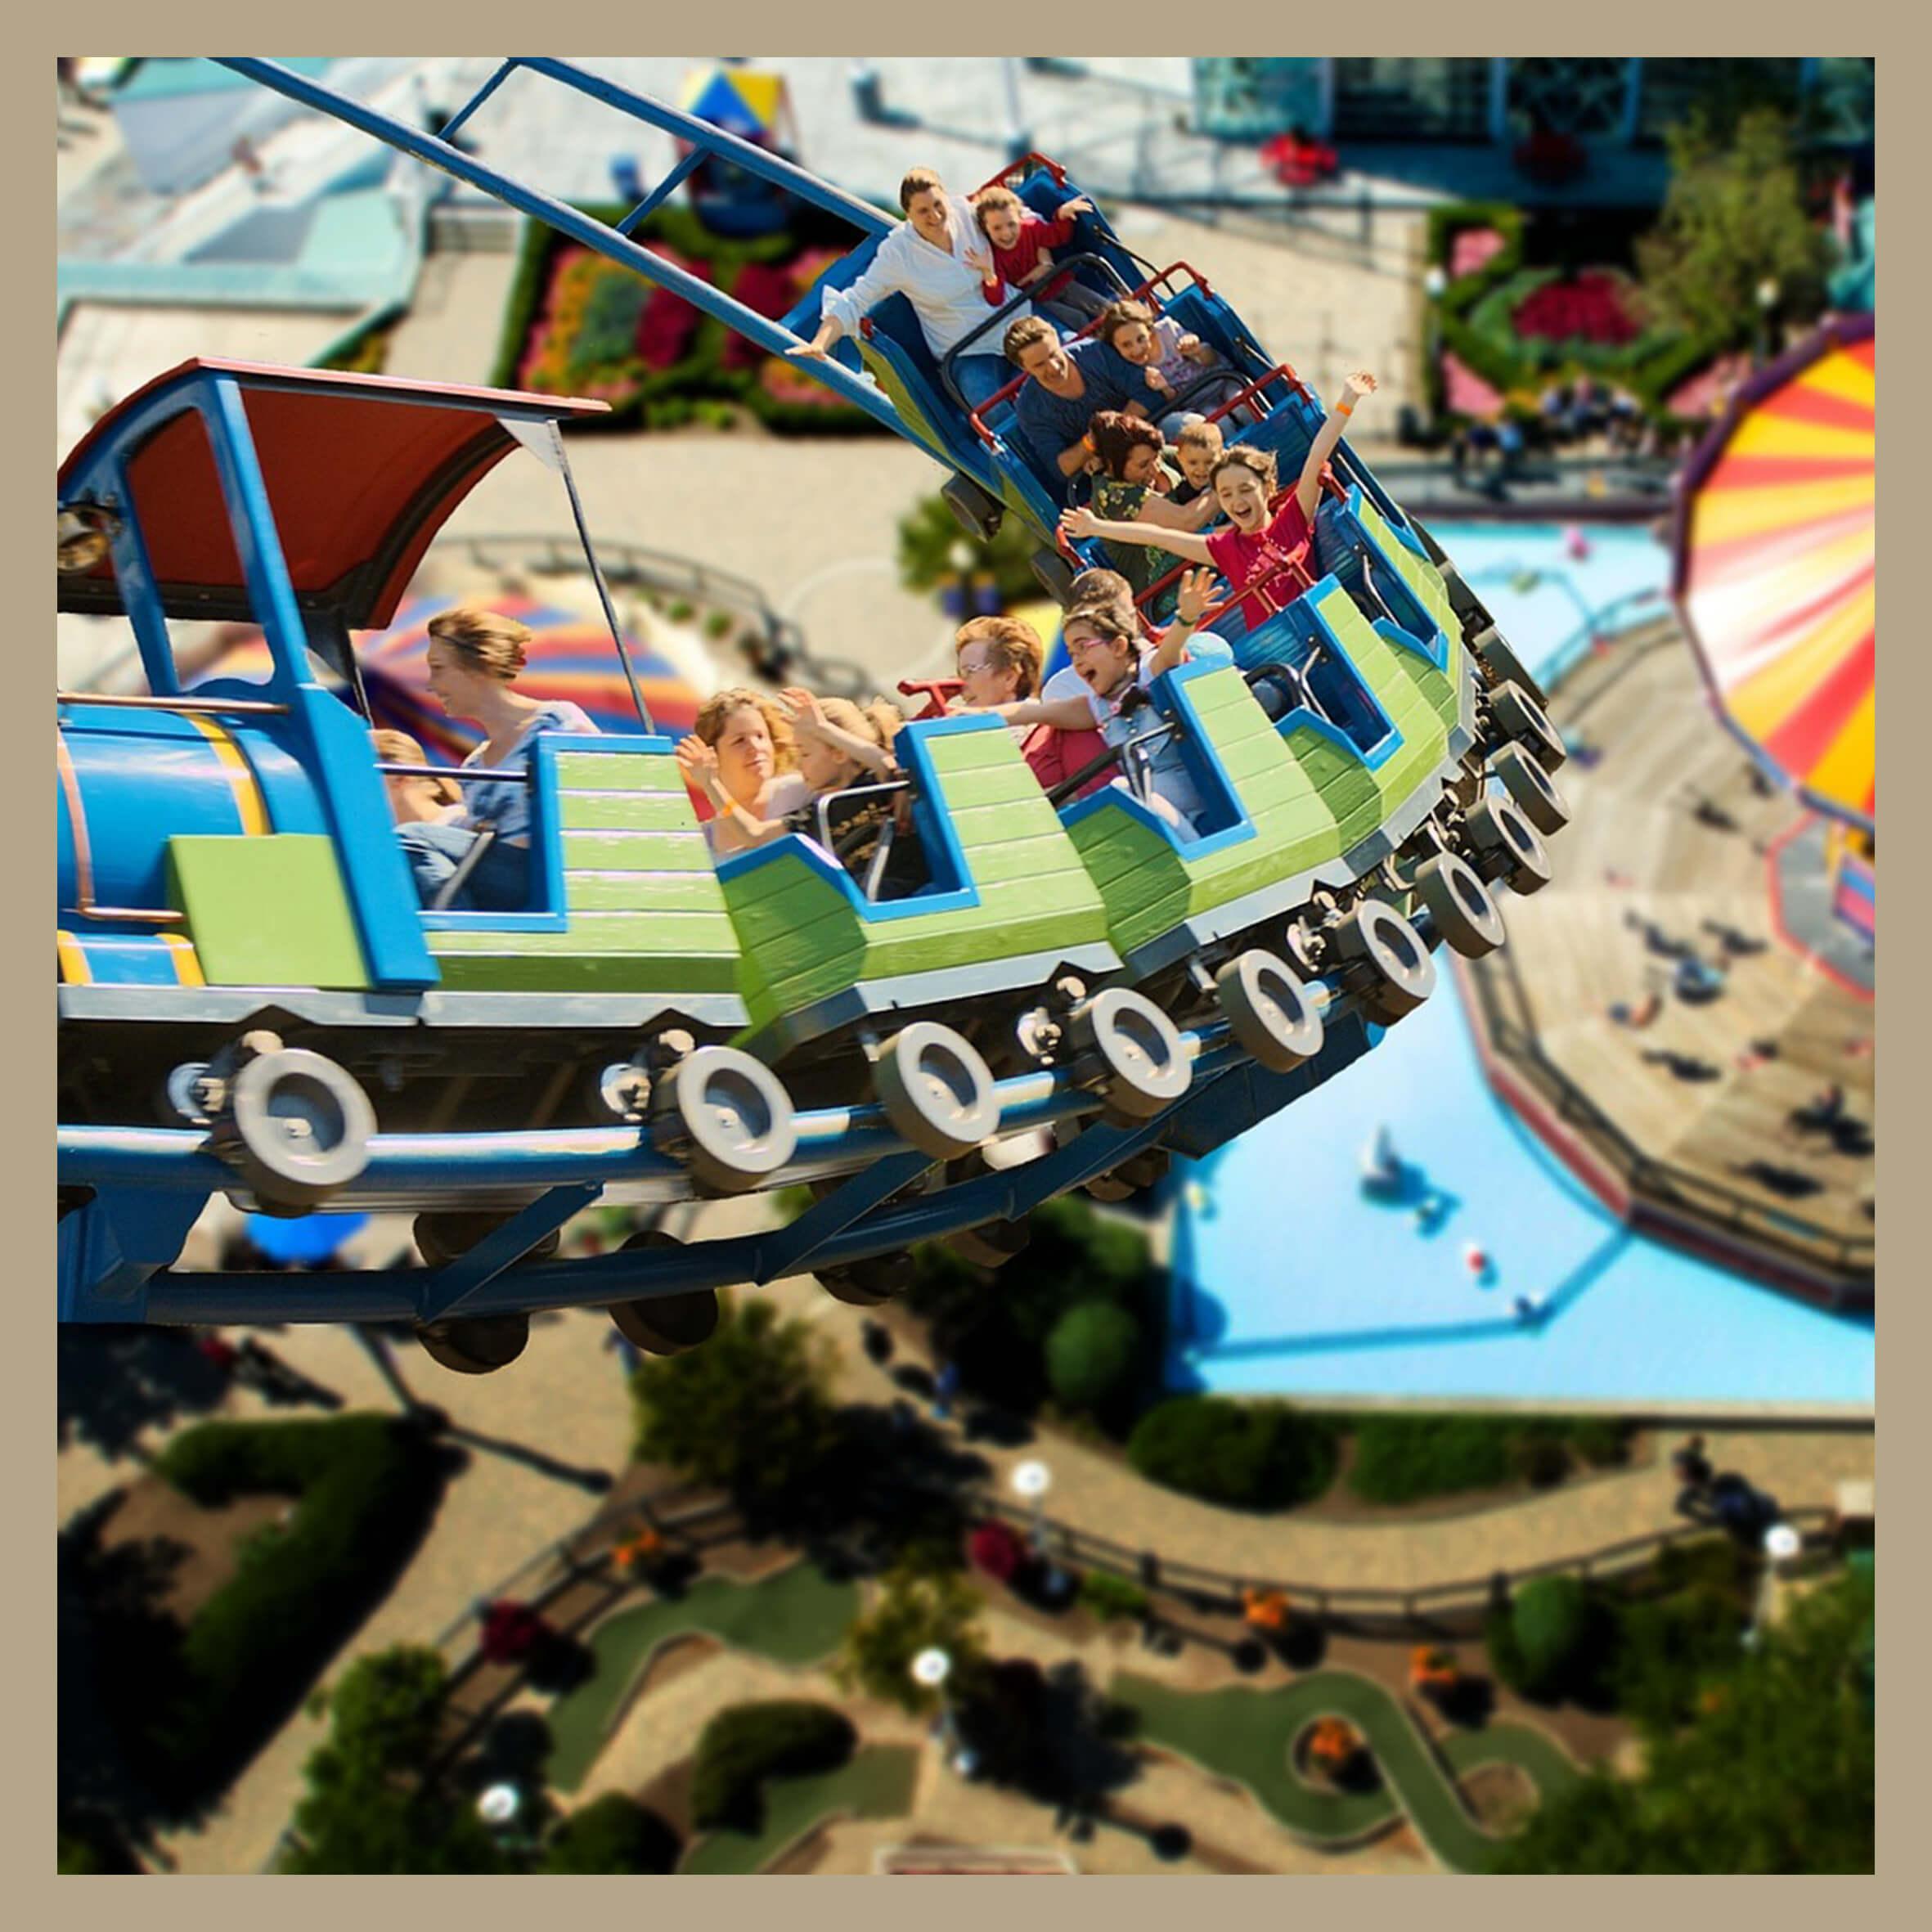 roller-coaster-2051556_1920-